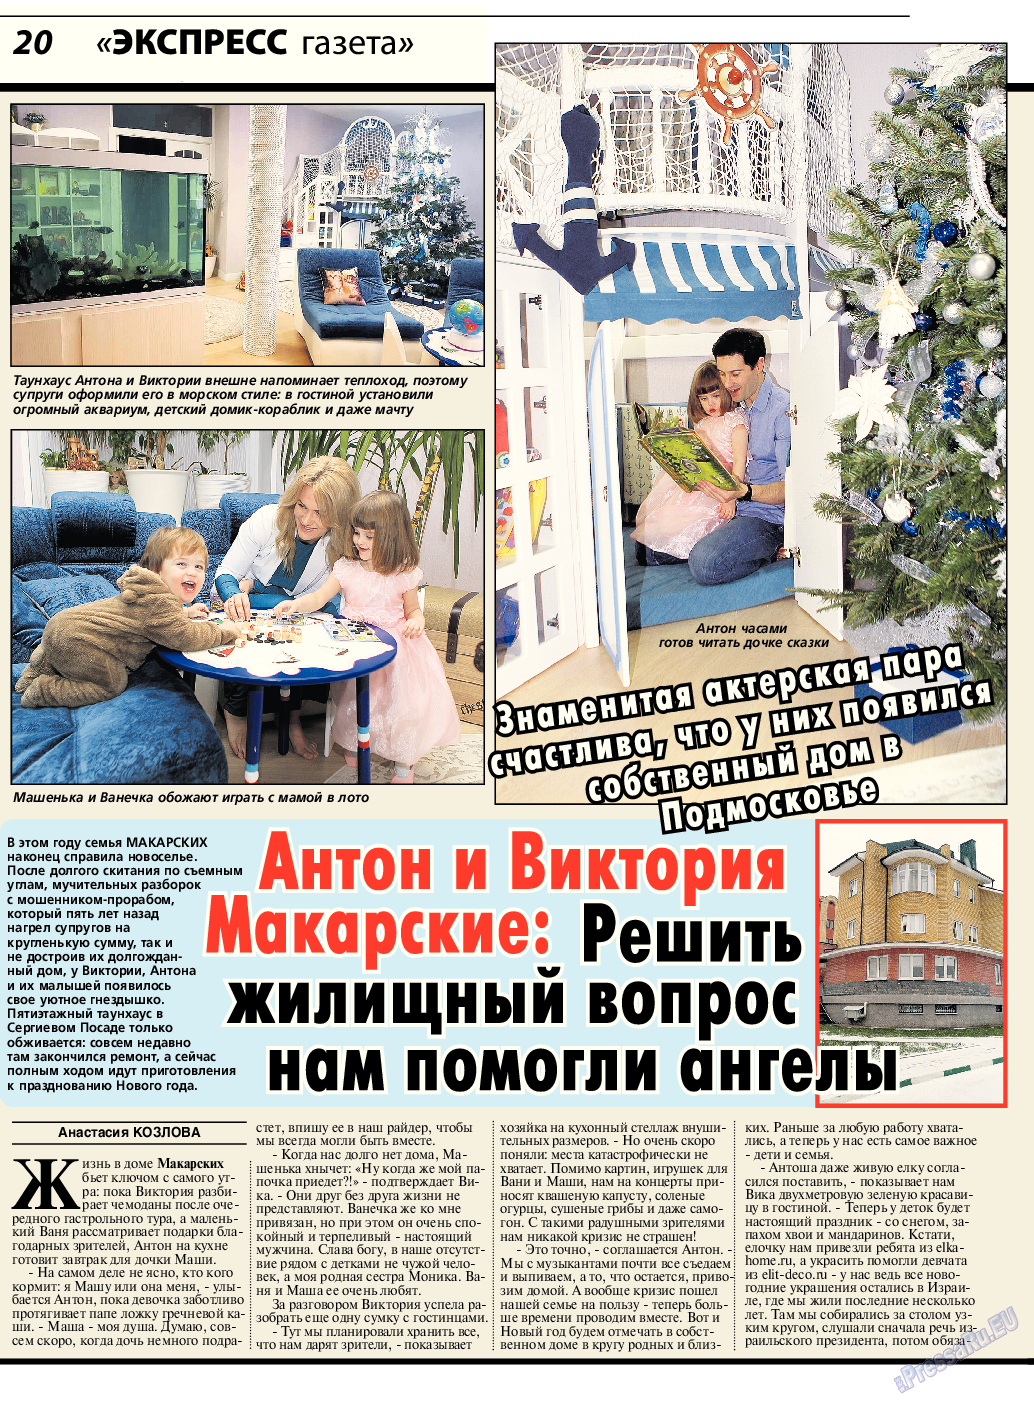 Экспресс газета (газета). 2017 год, номер 2, стр. 20